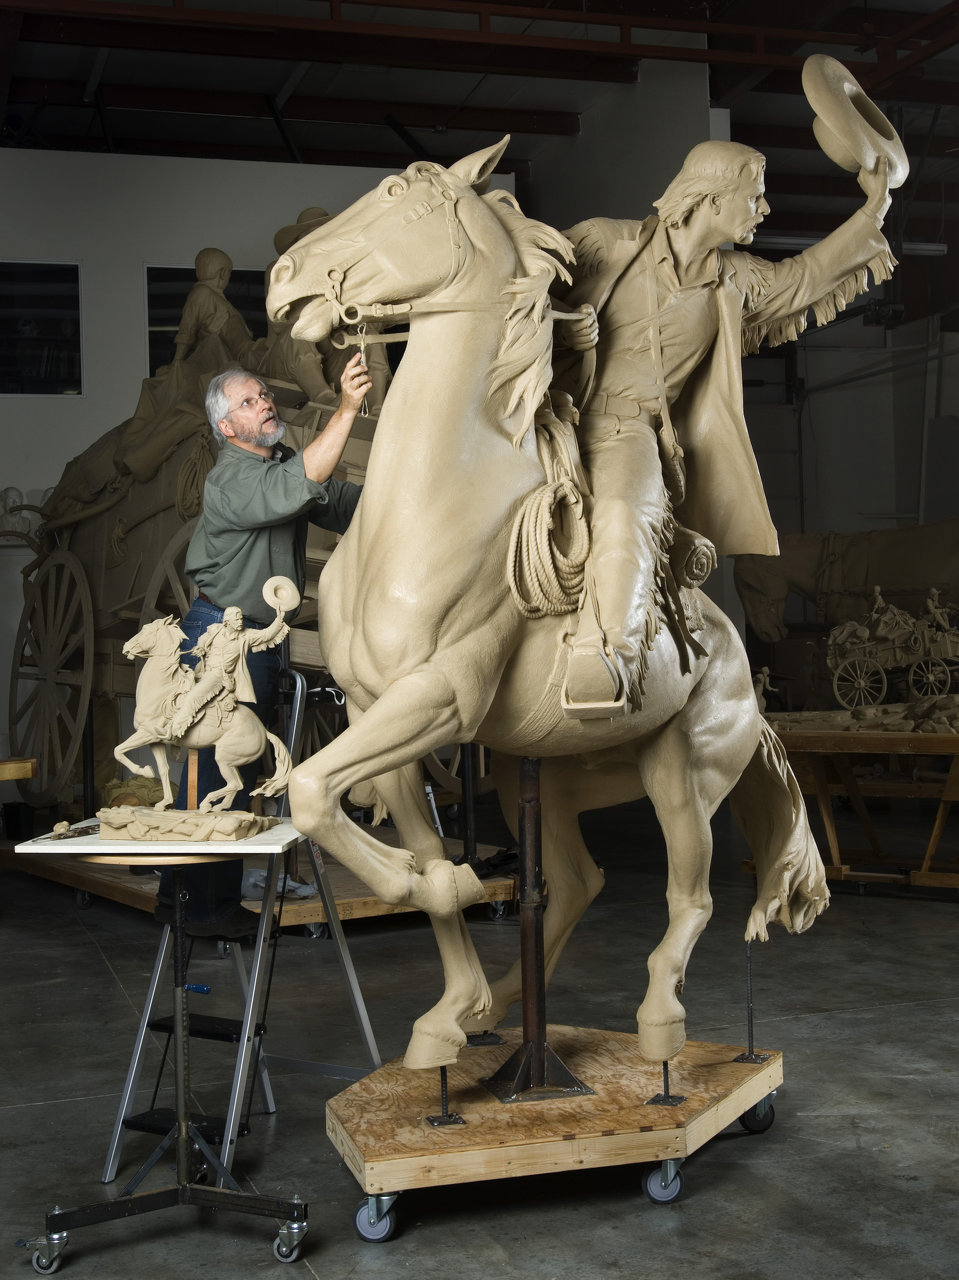 Blair working on The Wagon Master